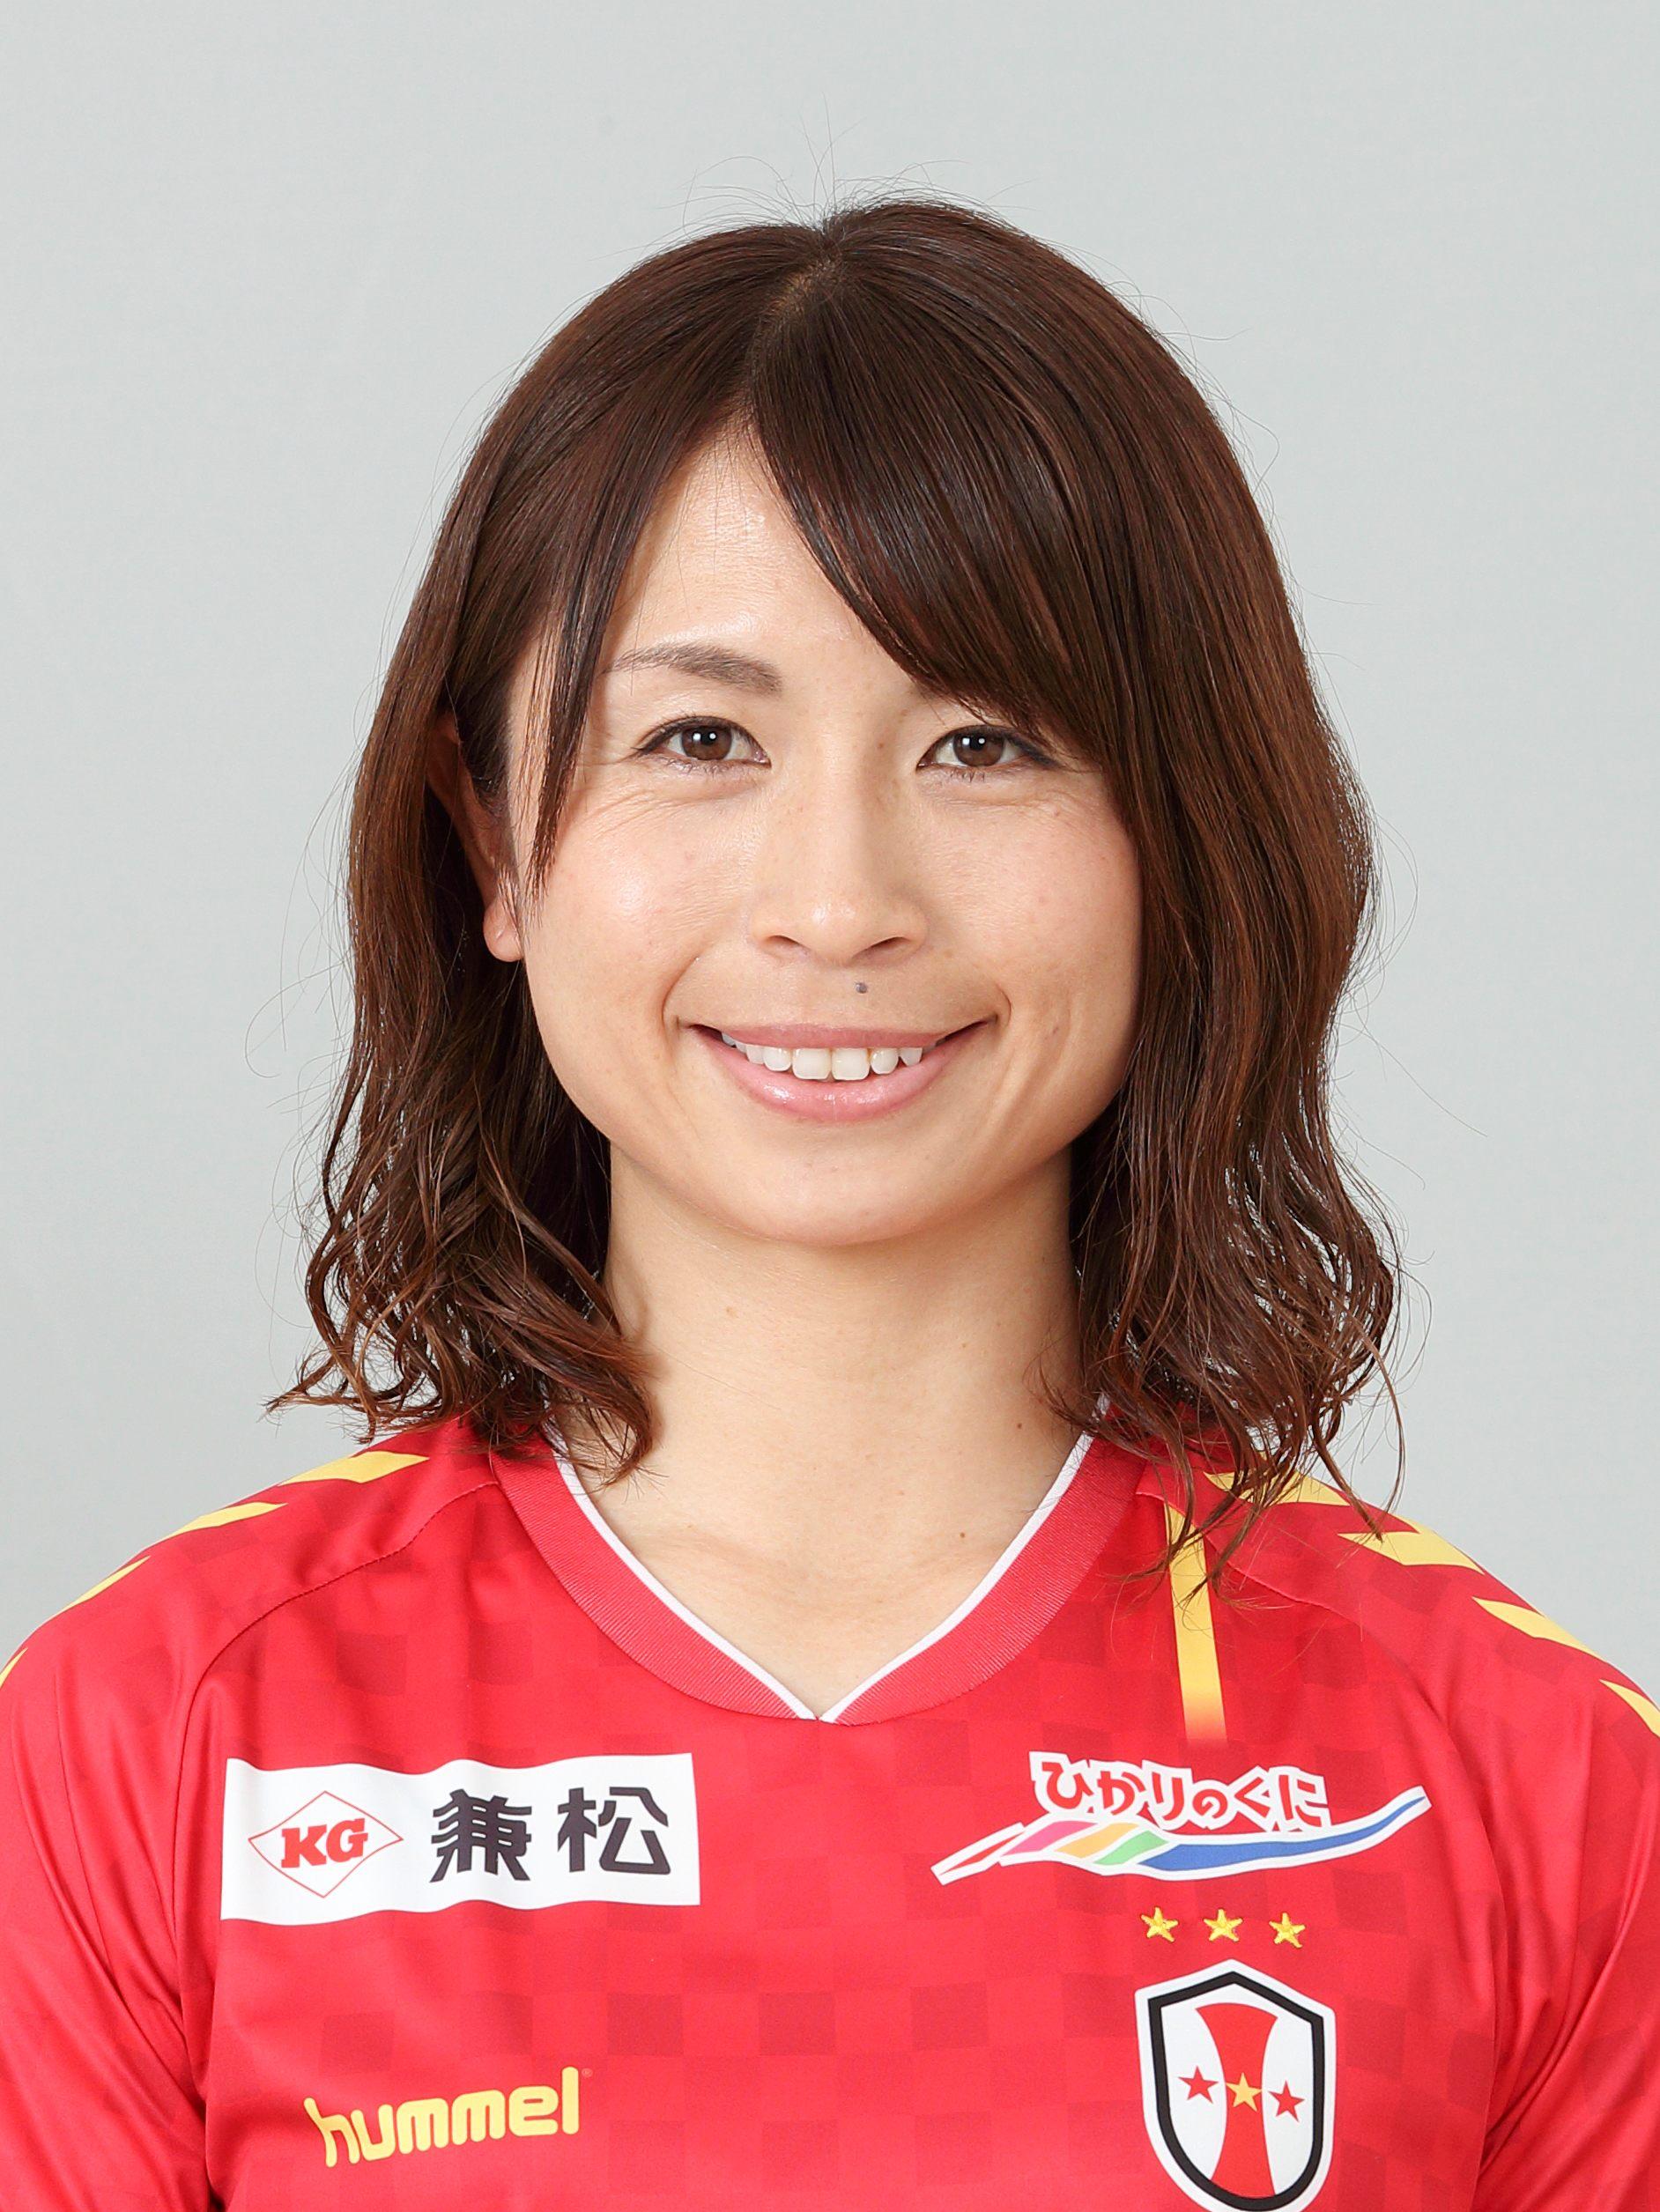 HAPPY BIRTHDAY!! 本日は鮫島彩 選手の誕生日です!